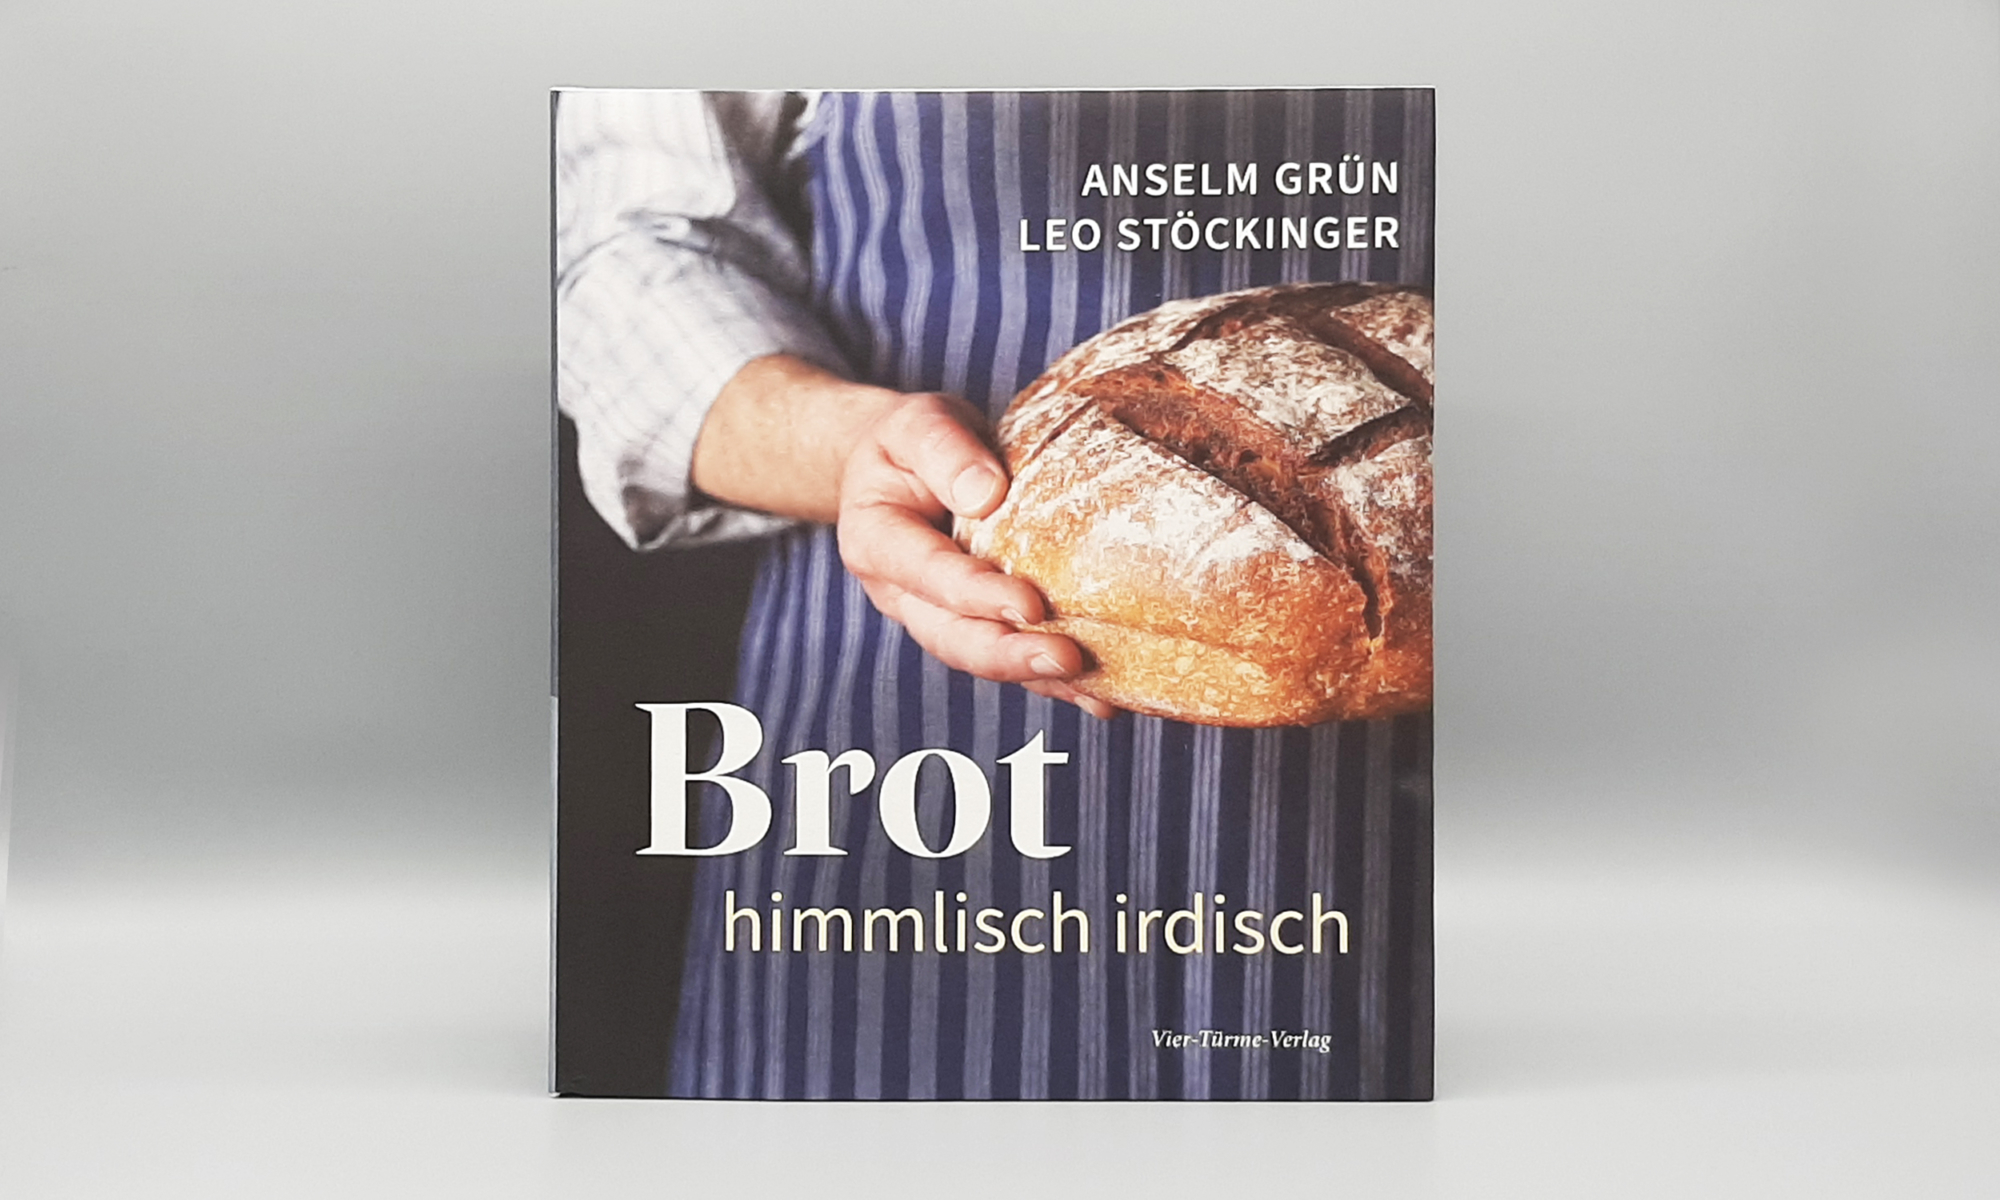 Brot himmlisch2